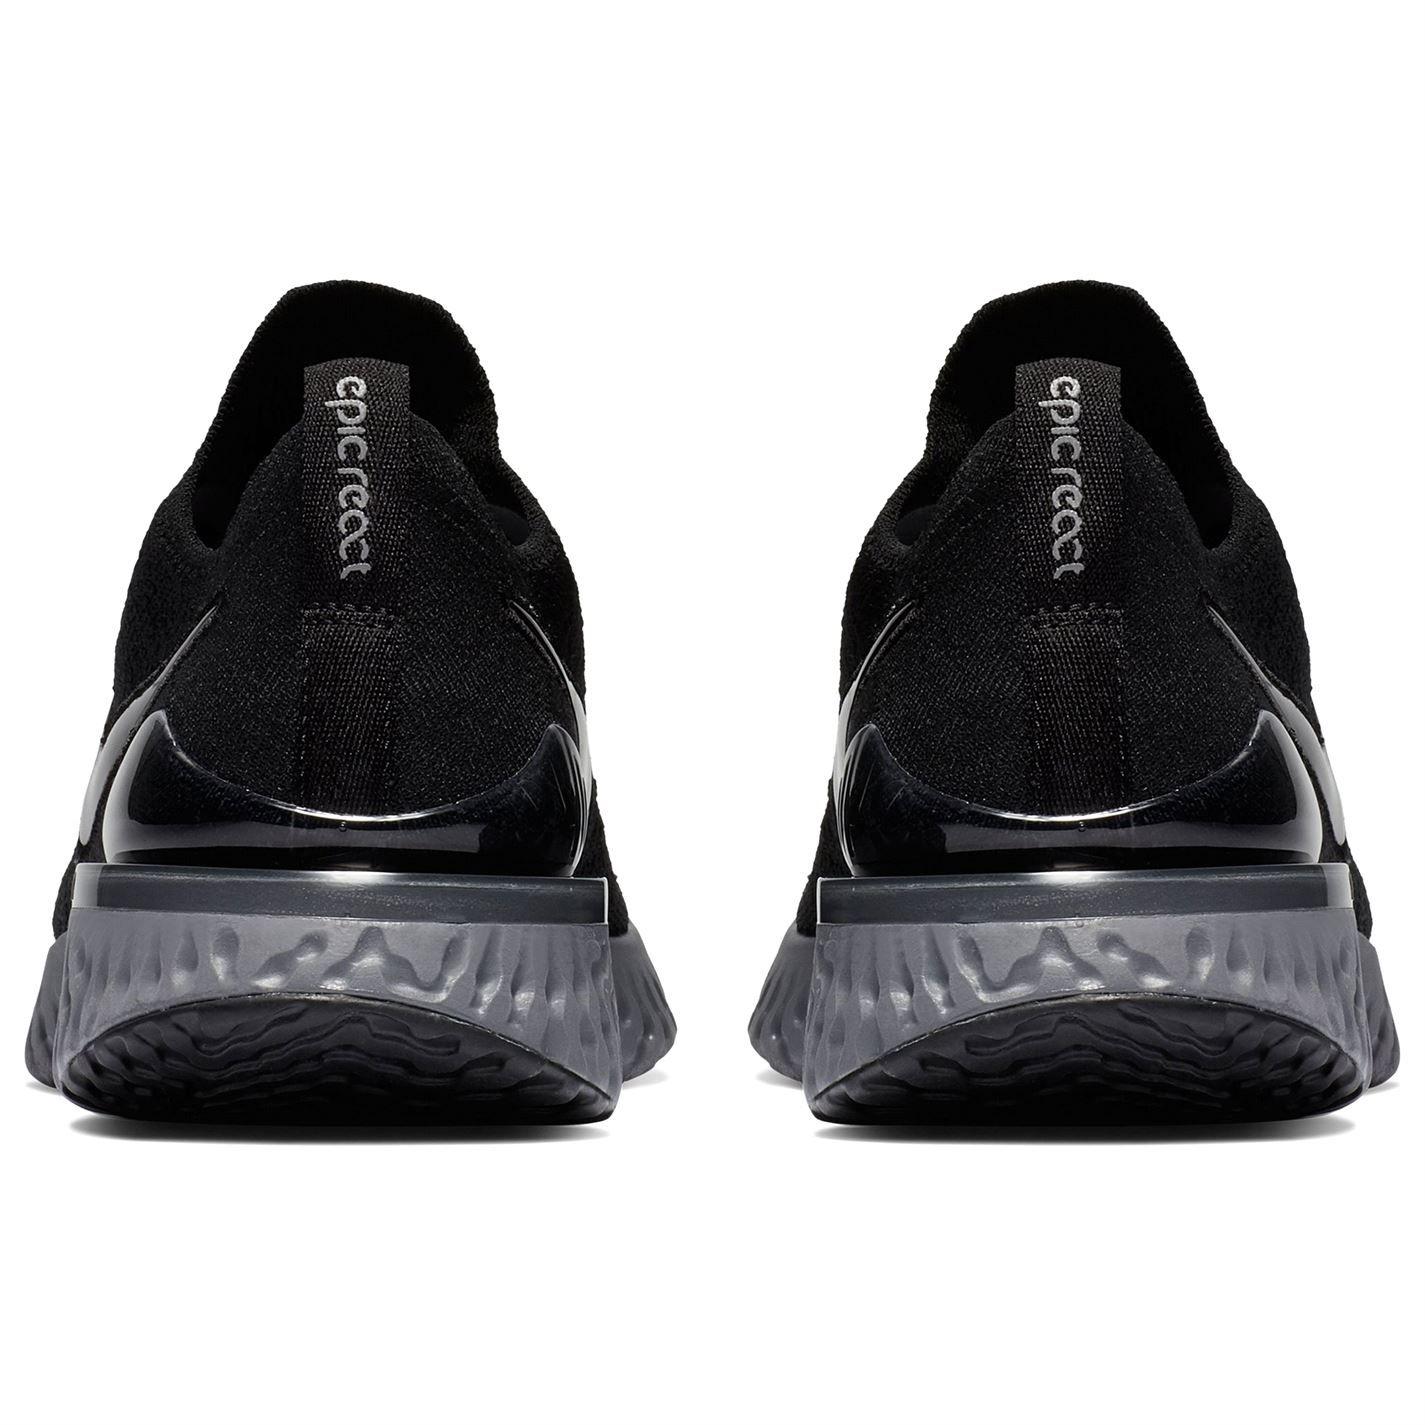 d60155b47dc Nike Epic React Flyknit 2 Ladies Running Trainers. Рейтинг: - 19%.  Thumbnail 1 Thumbnail 1 Thumbnail 1 Thumbnail 1 ...